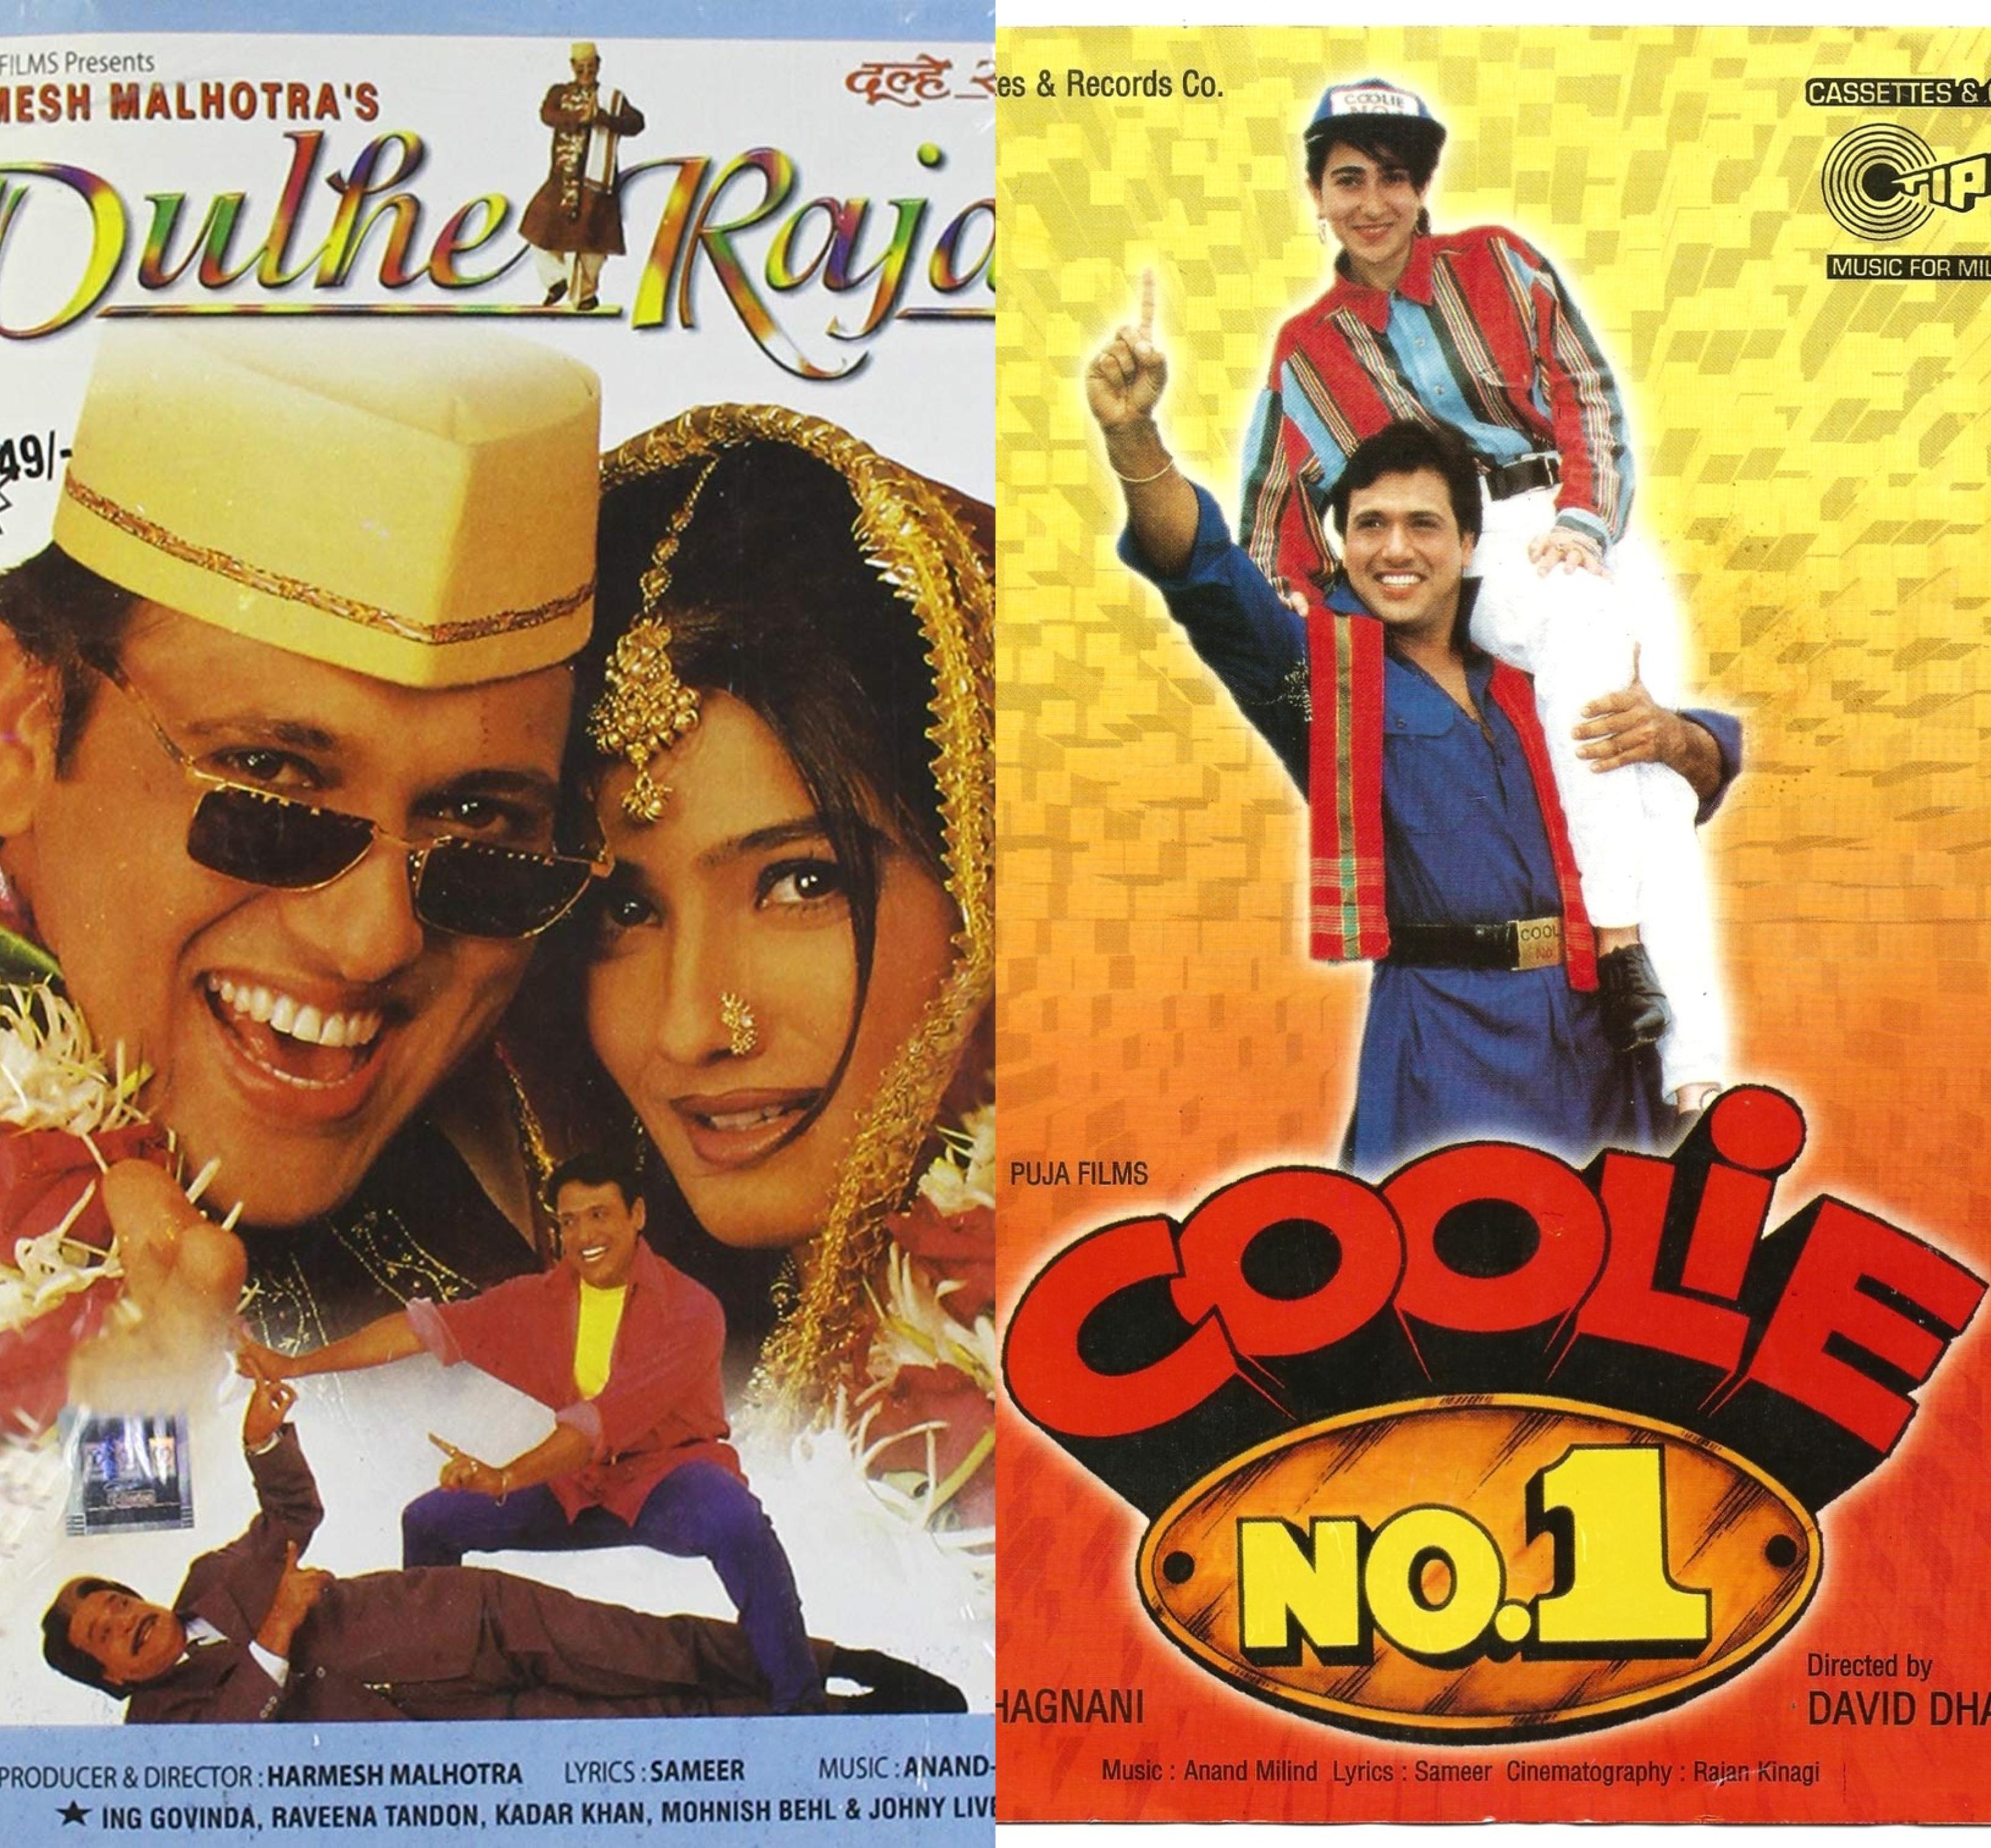 Govinda's Top 10 Songs